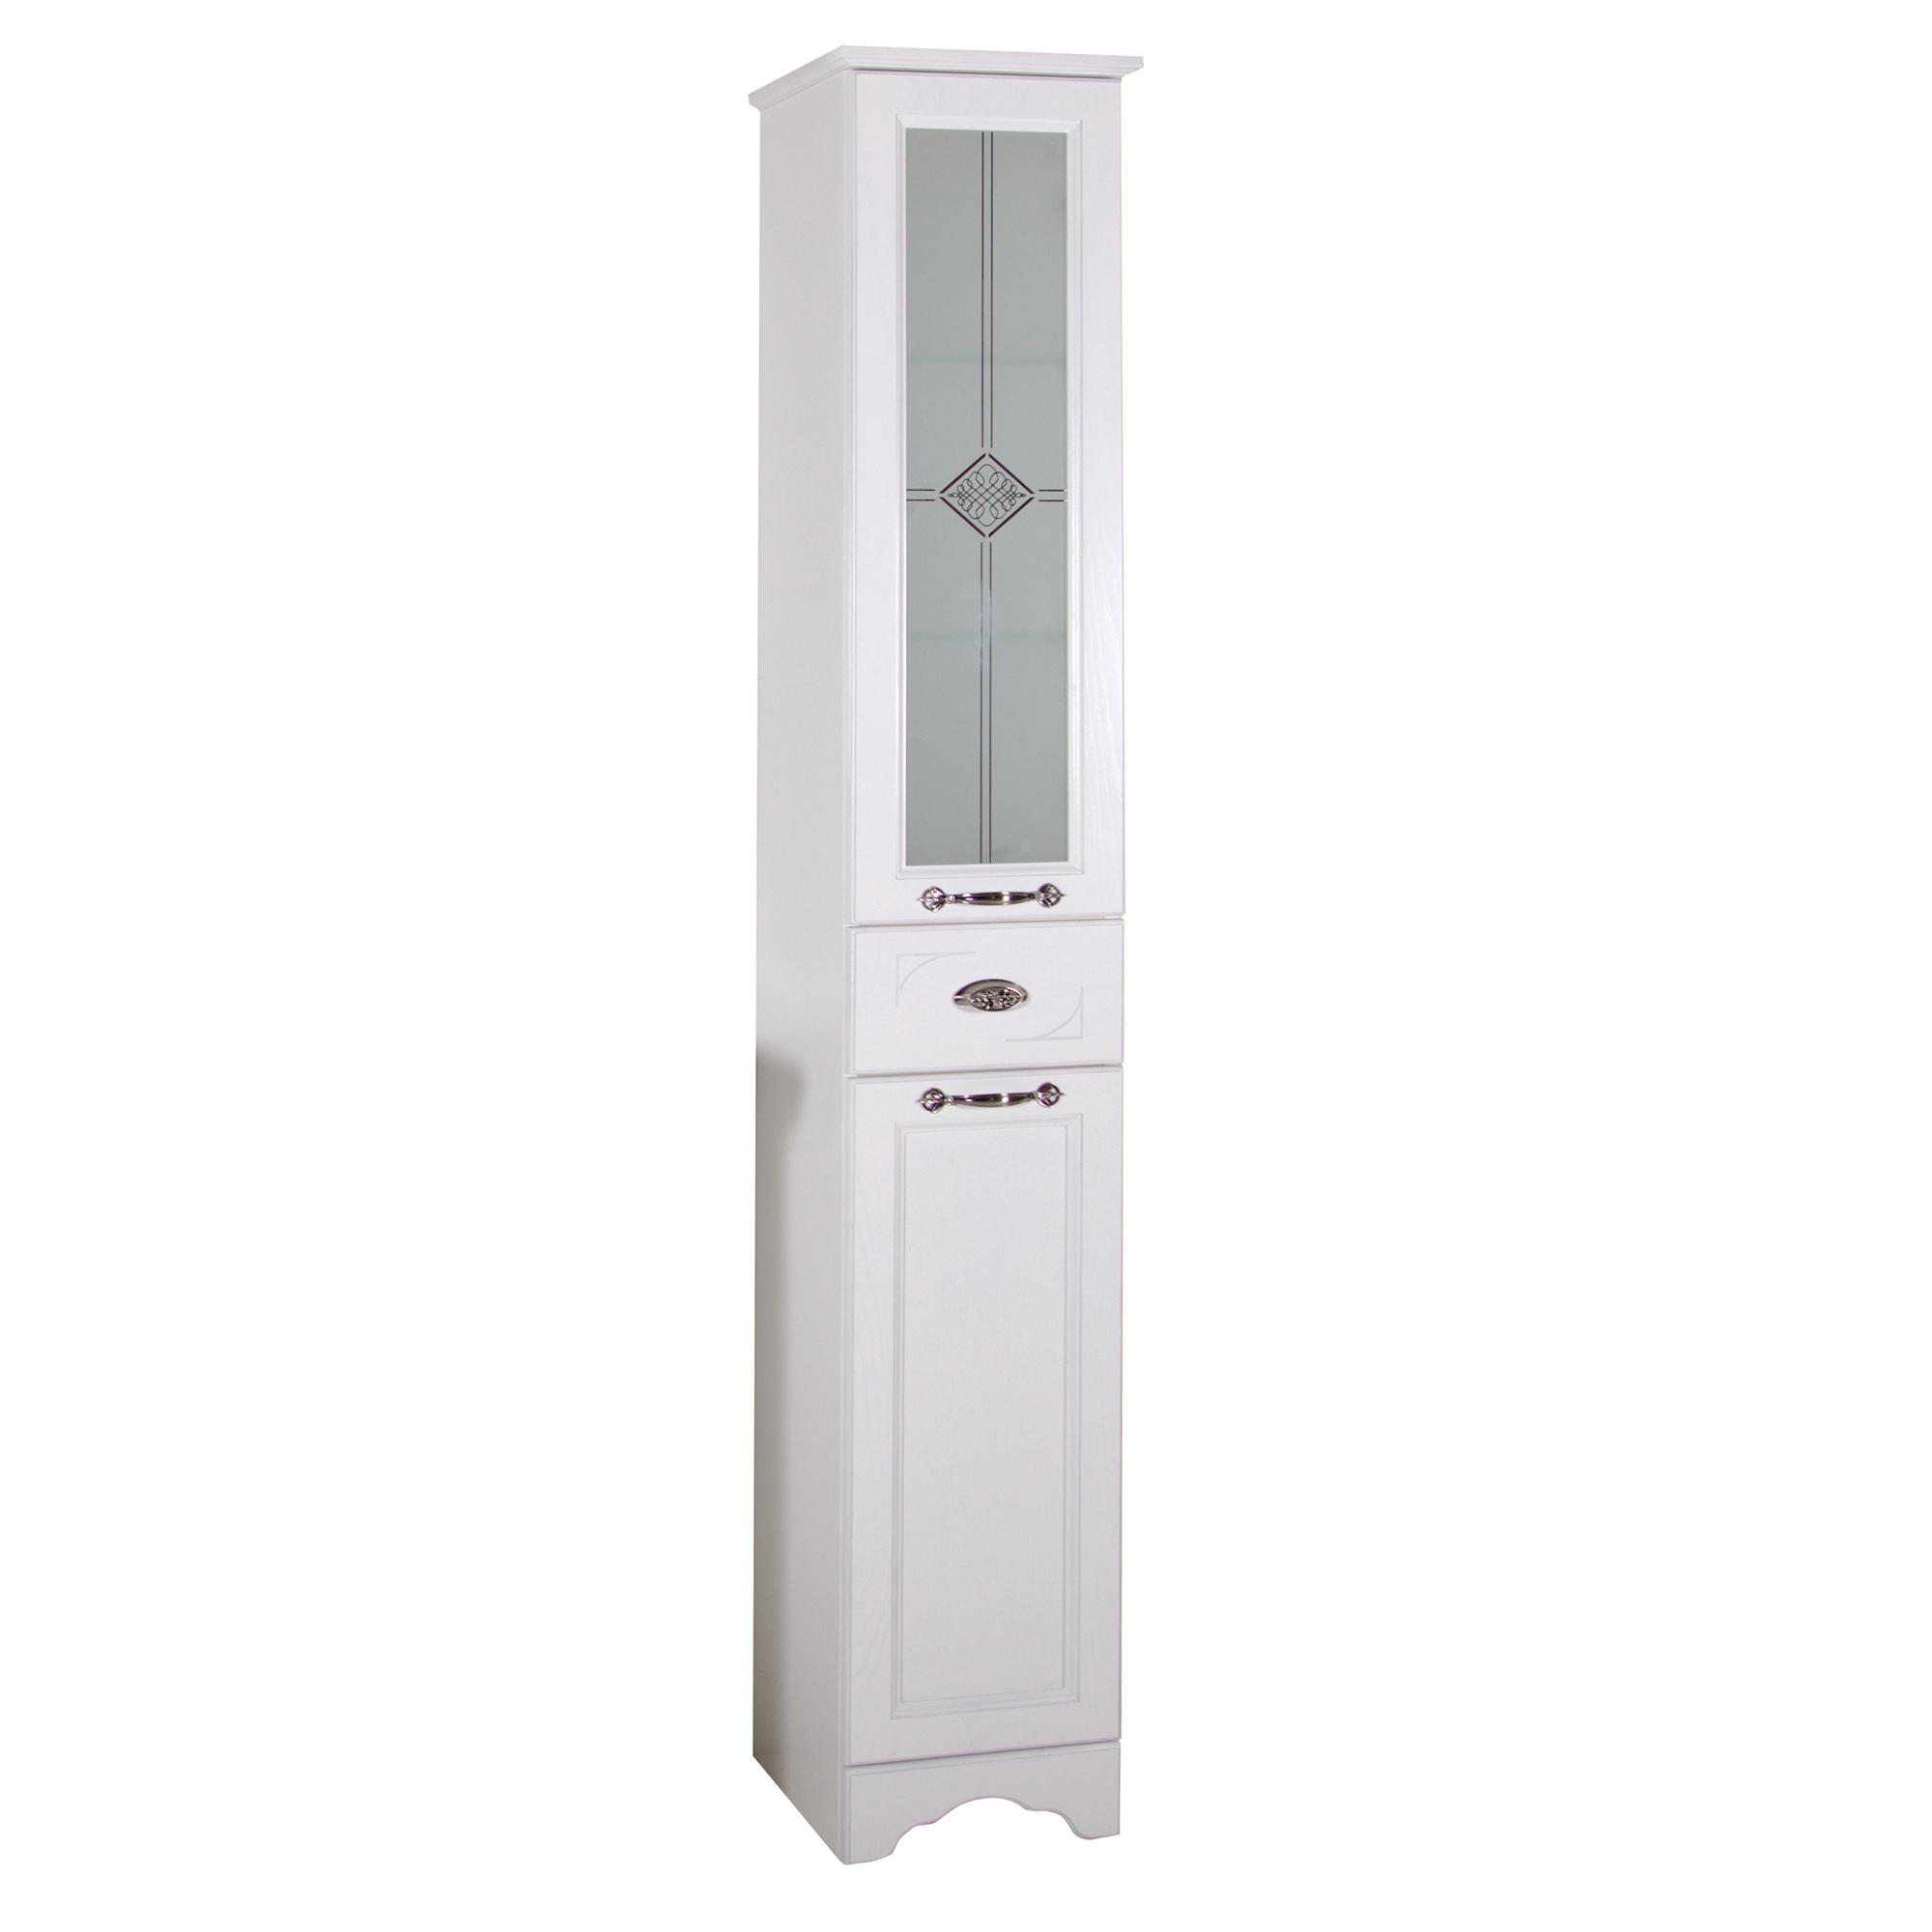 Пенал АСБ мебель Бергамо Woodline белый/патина серебро цена